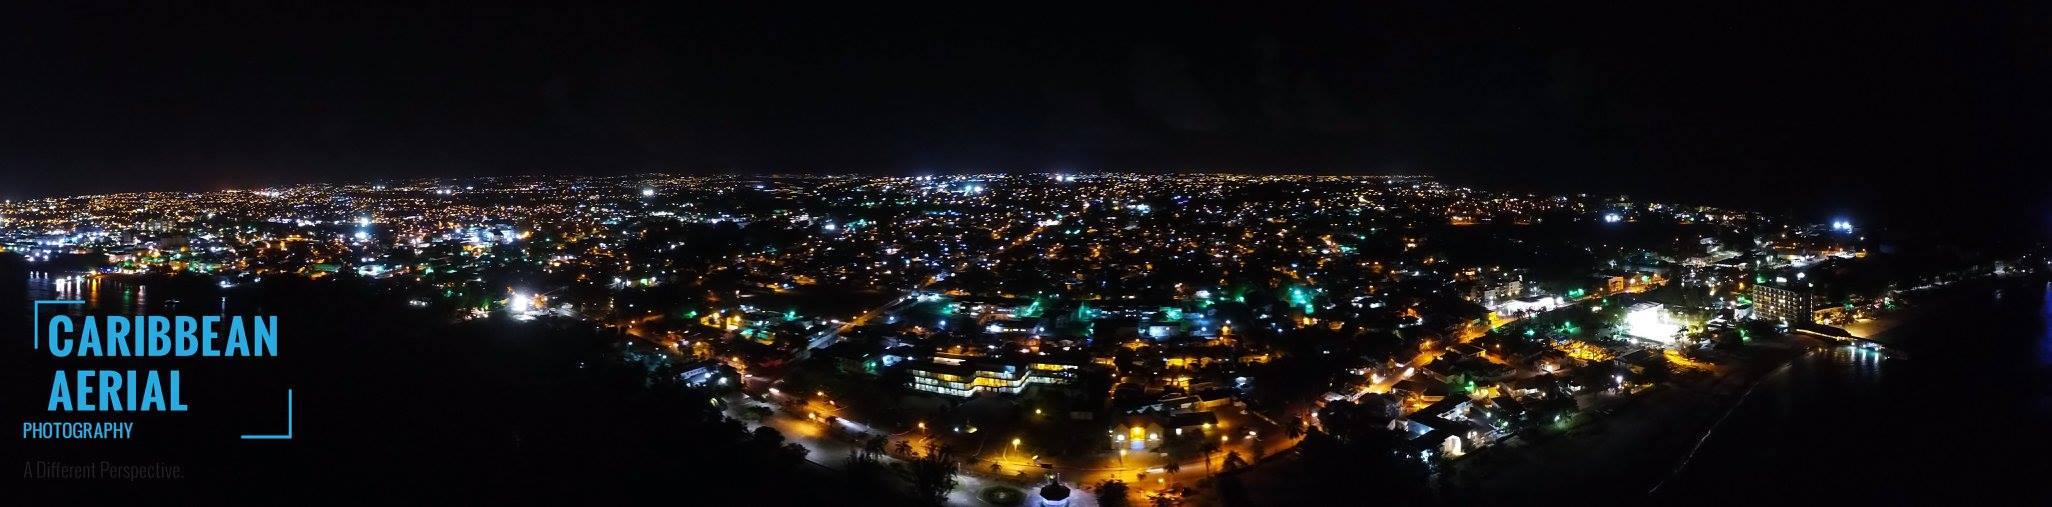 caribbean-aerial-photography-009